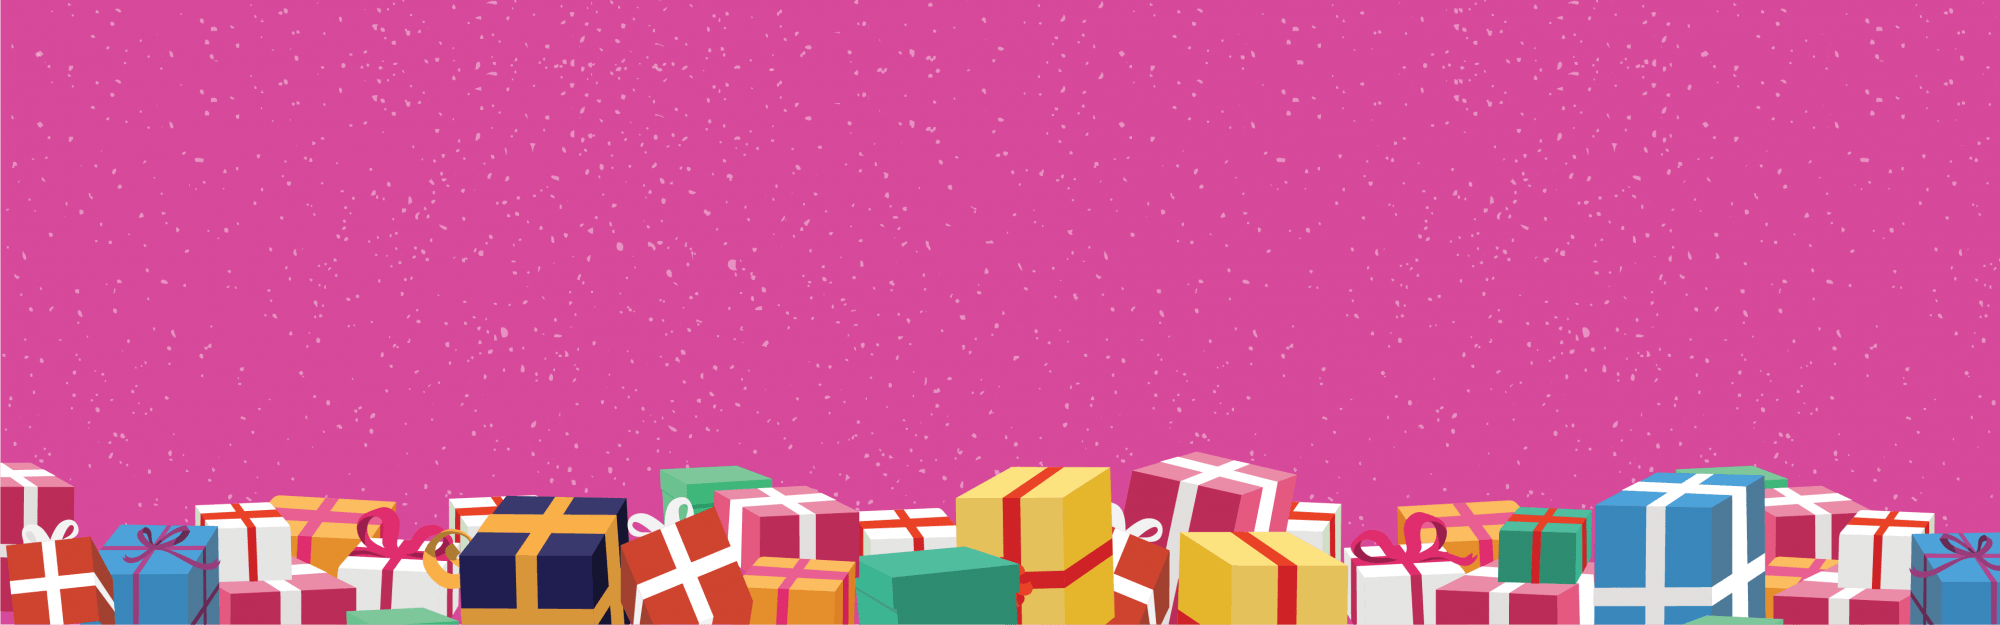 Berkeley Holidays Gift Guide